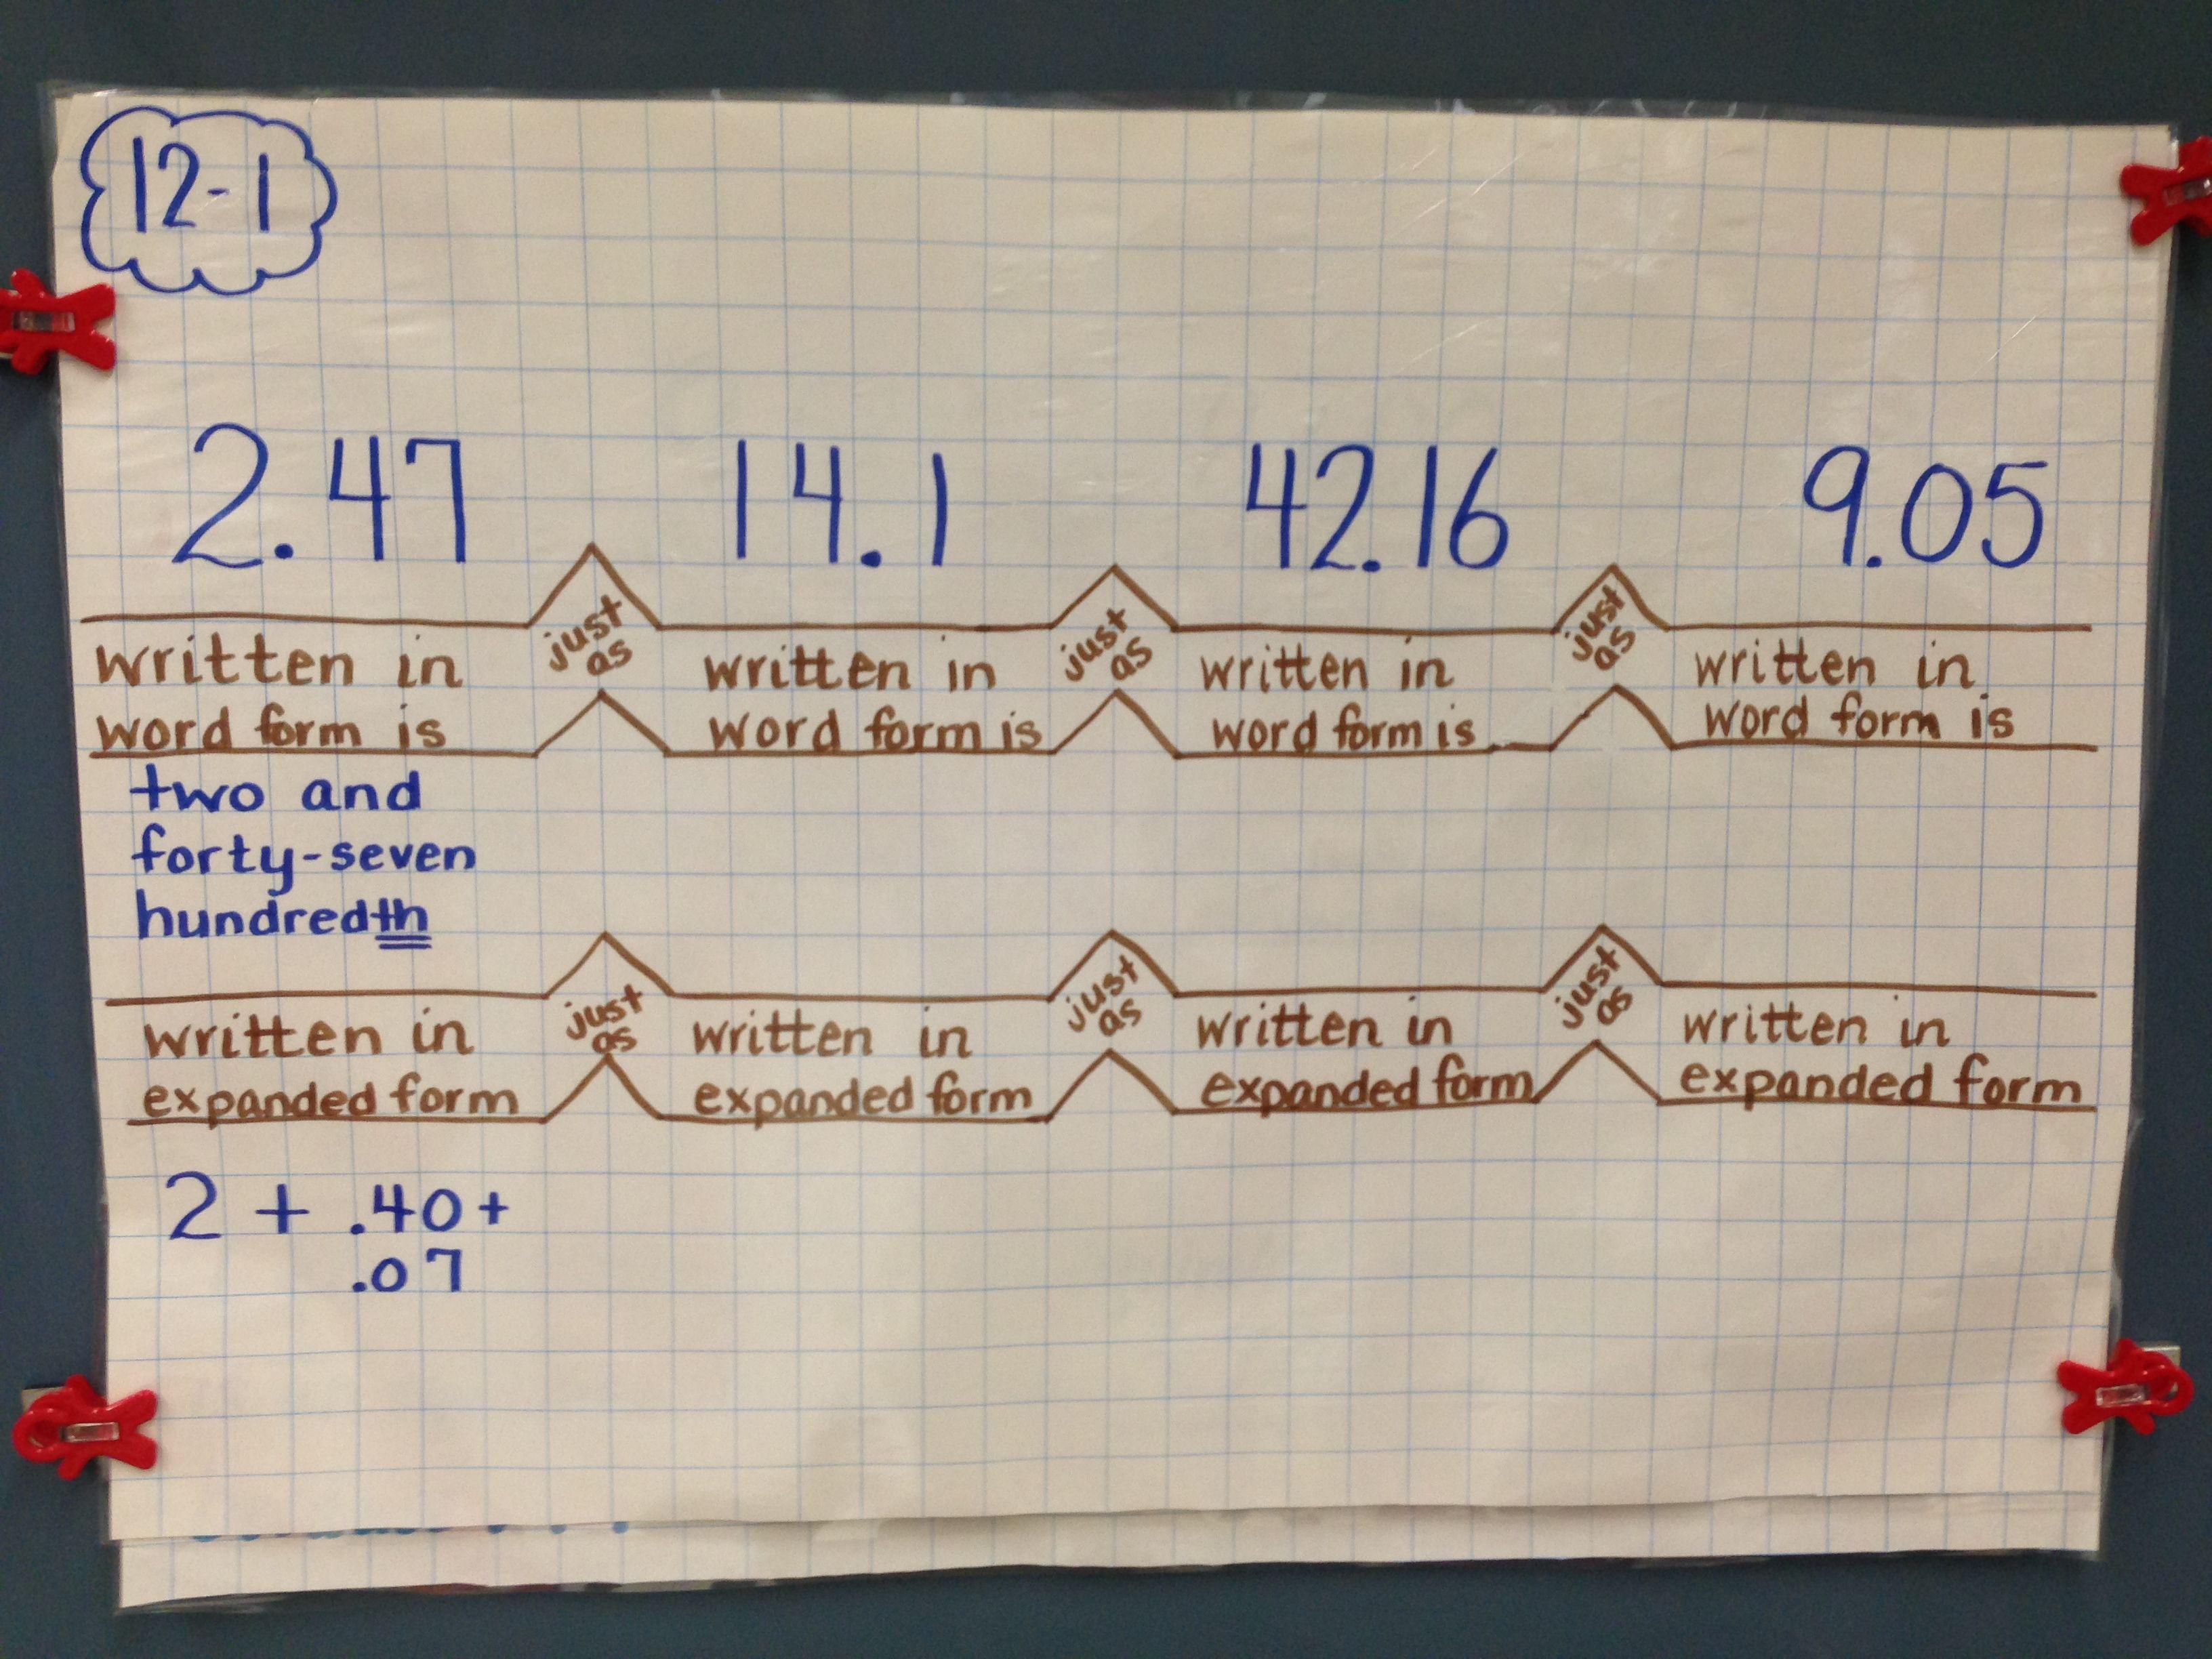 Brace map decimals thinking map ideas pinterest thinking maps brace map decimals falaconquin